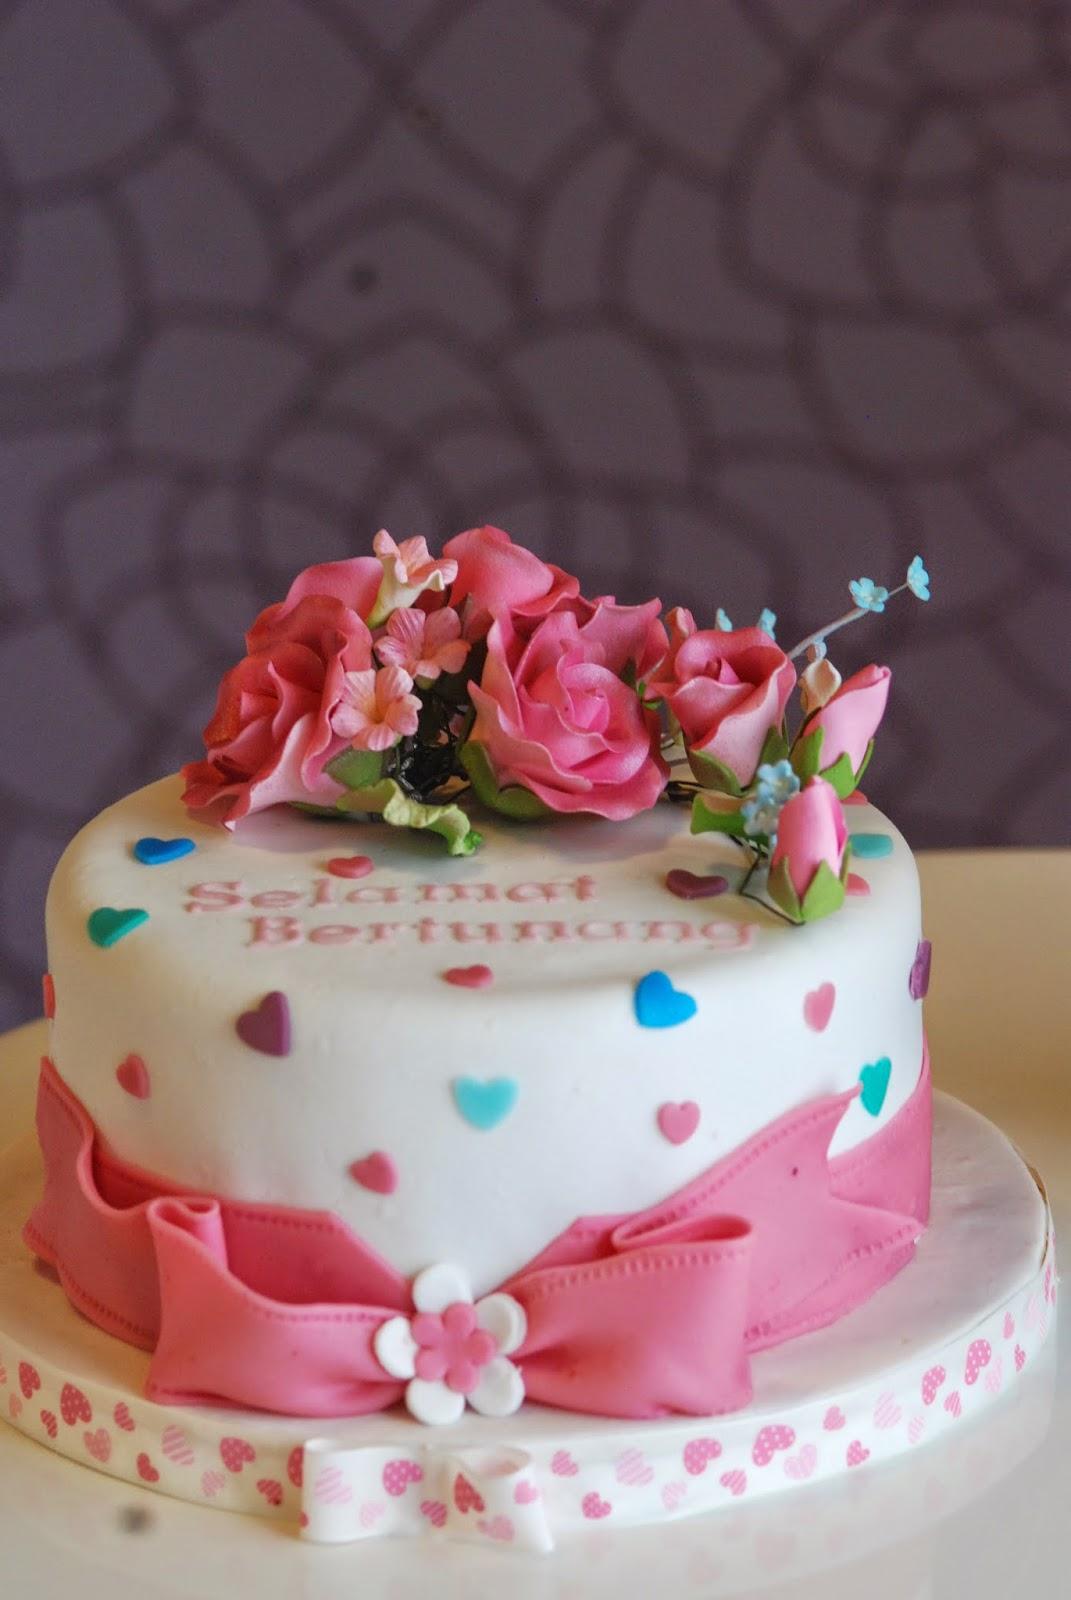 nak tengok kek tunang kami yang paling famous 2014